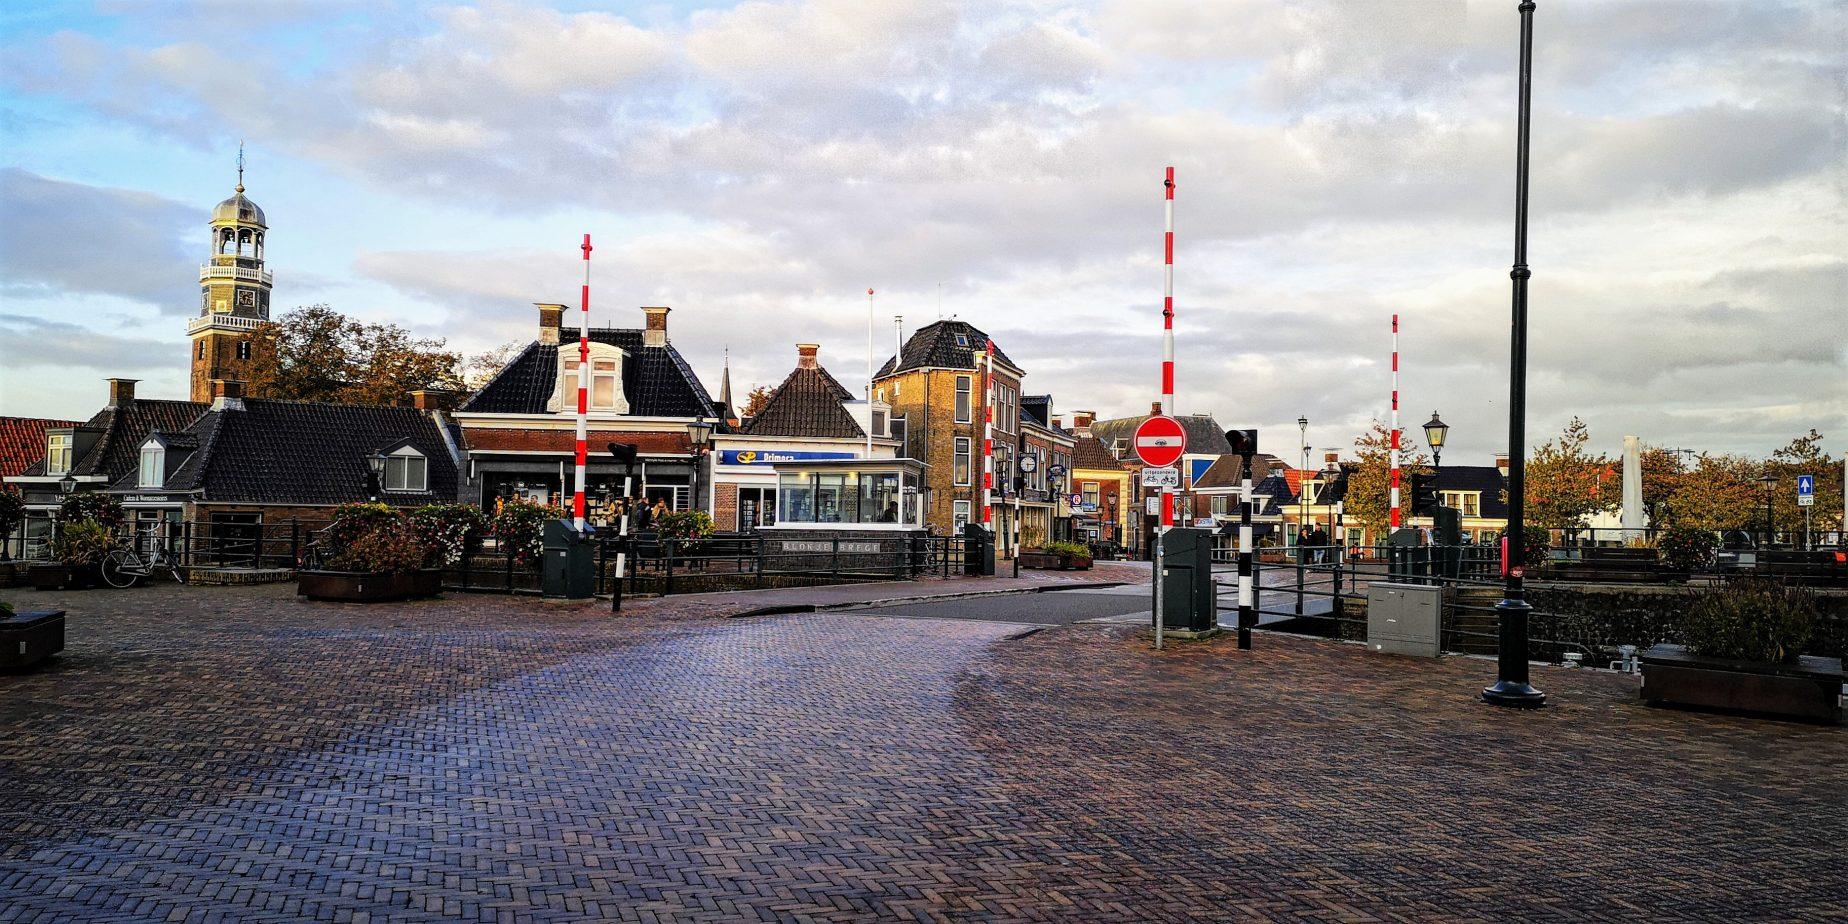 Blokkjesbrug Lemmer centrum